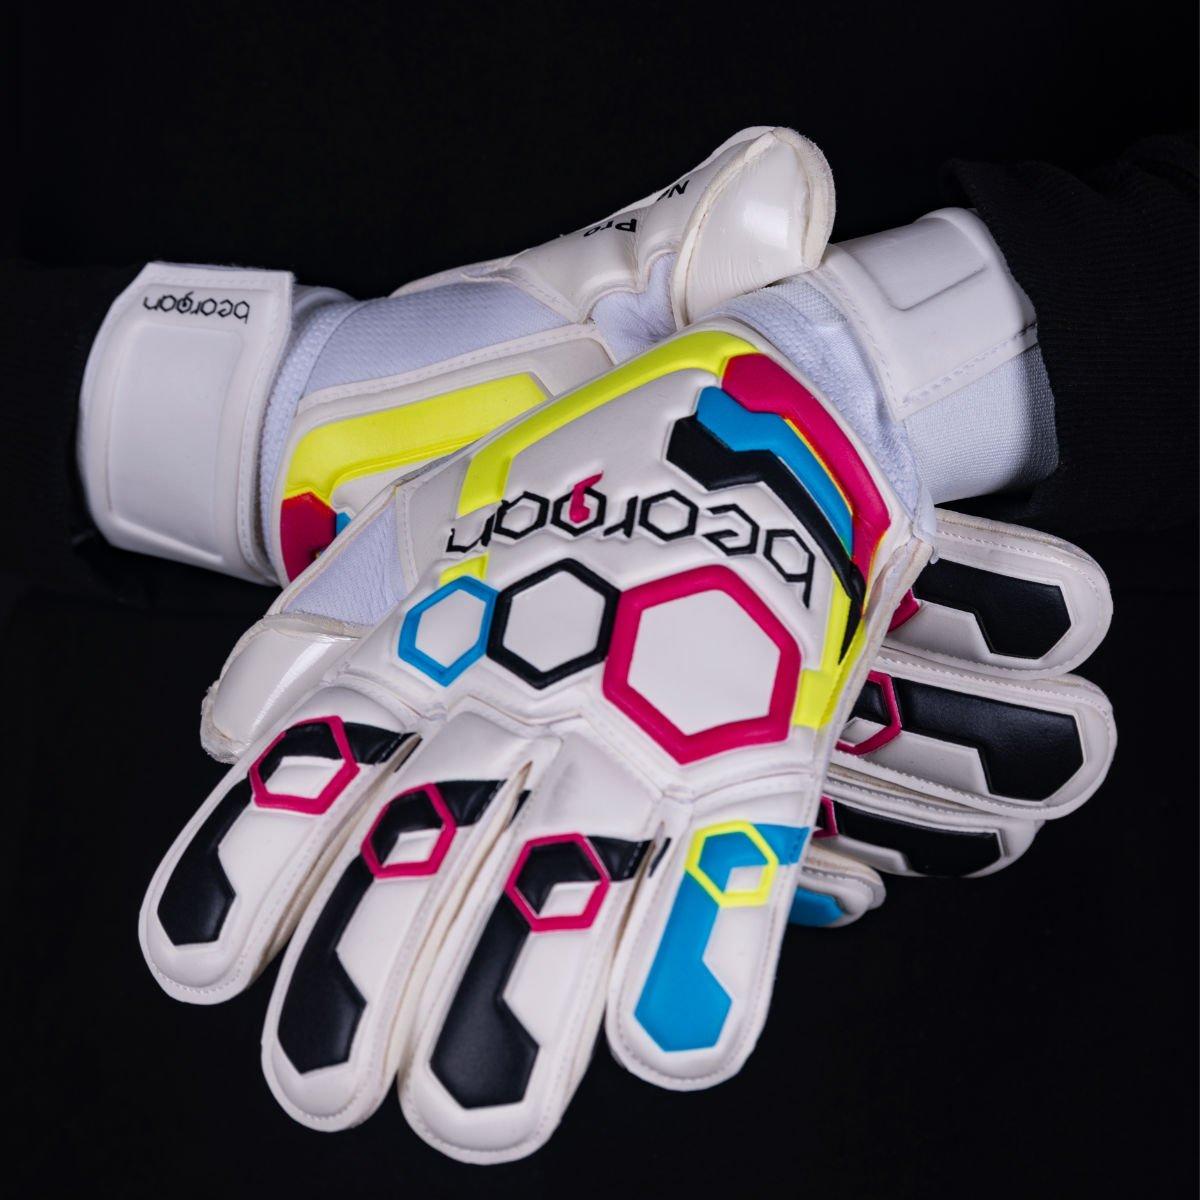 Beorgan Gloves – Premium Goalkeeping Gloves – New Zealand